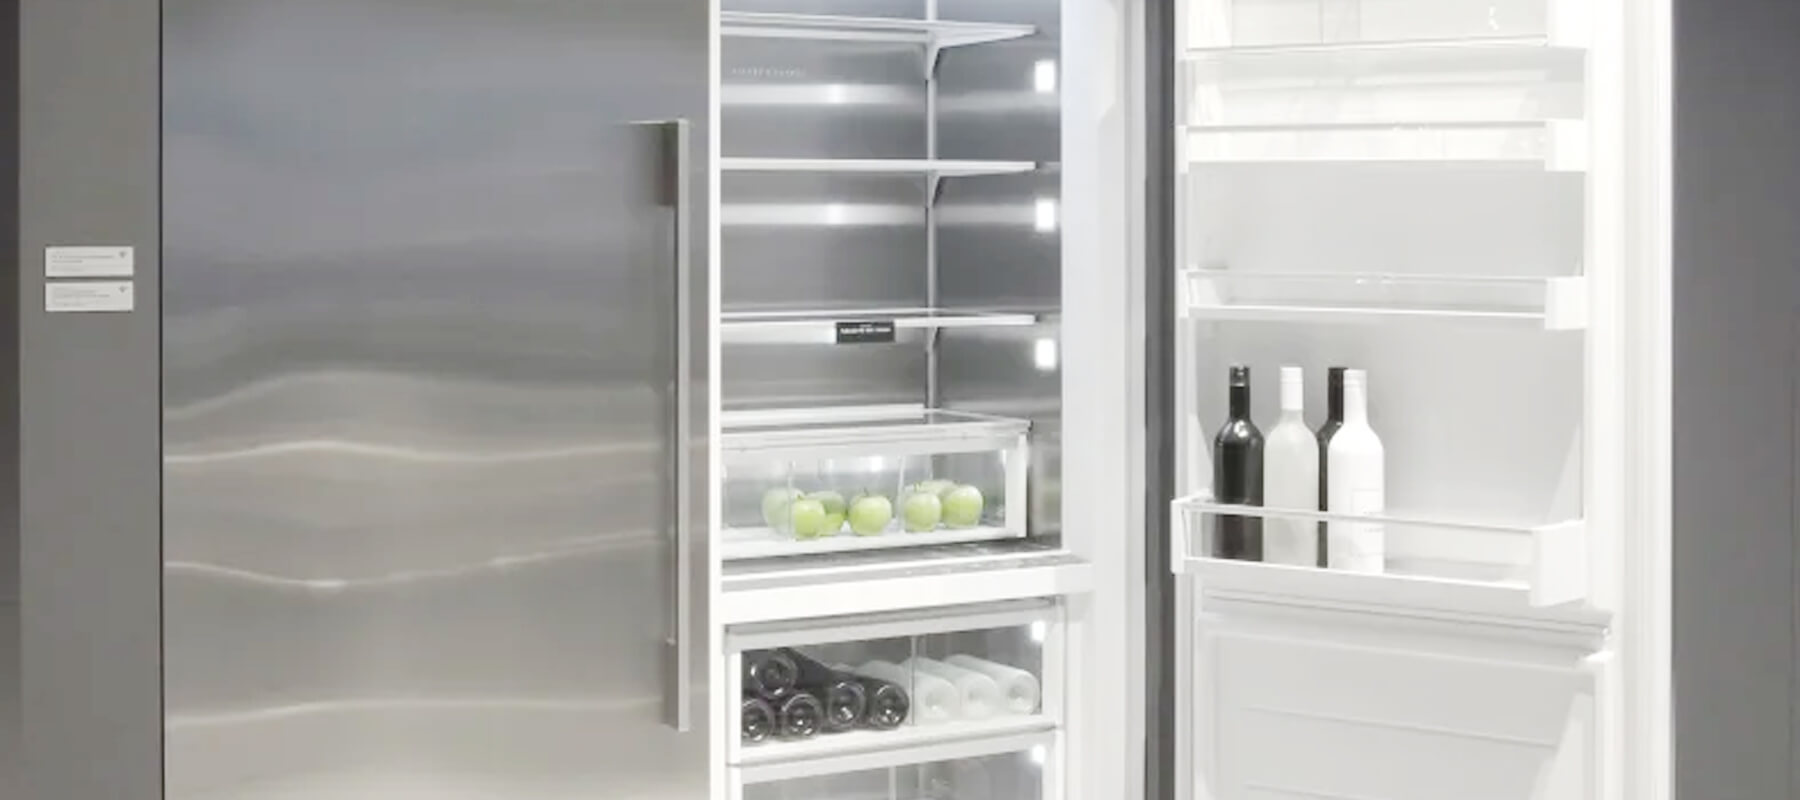 DCS Built in Refrigerator Service | Built in Refrigerator Repair Service